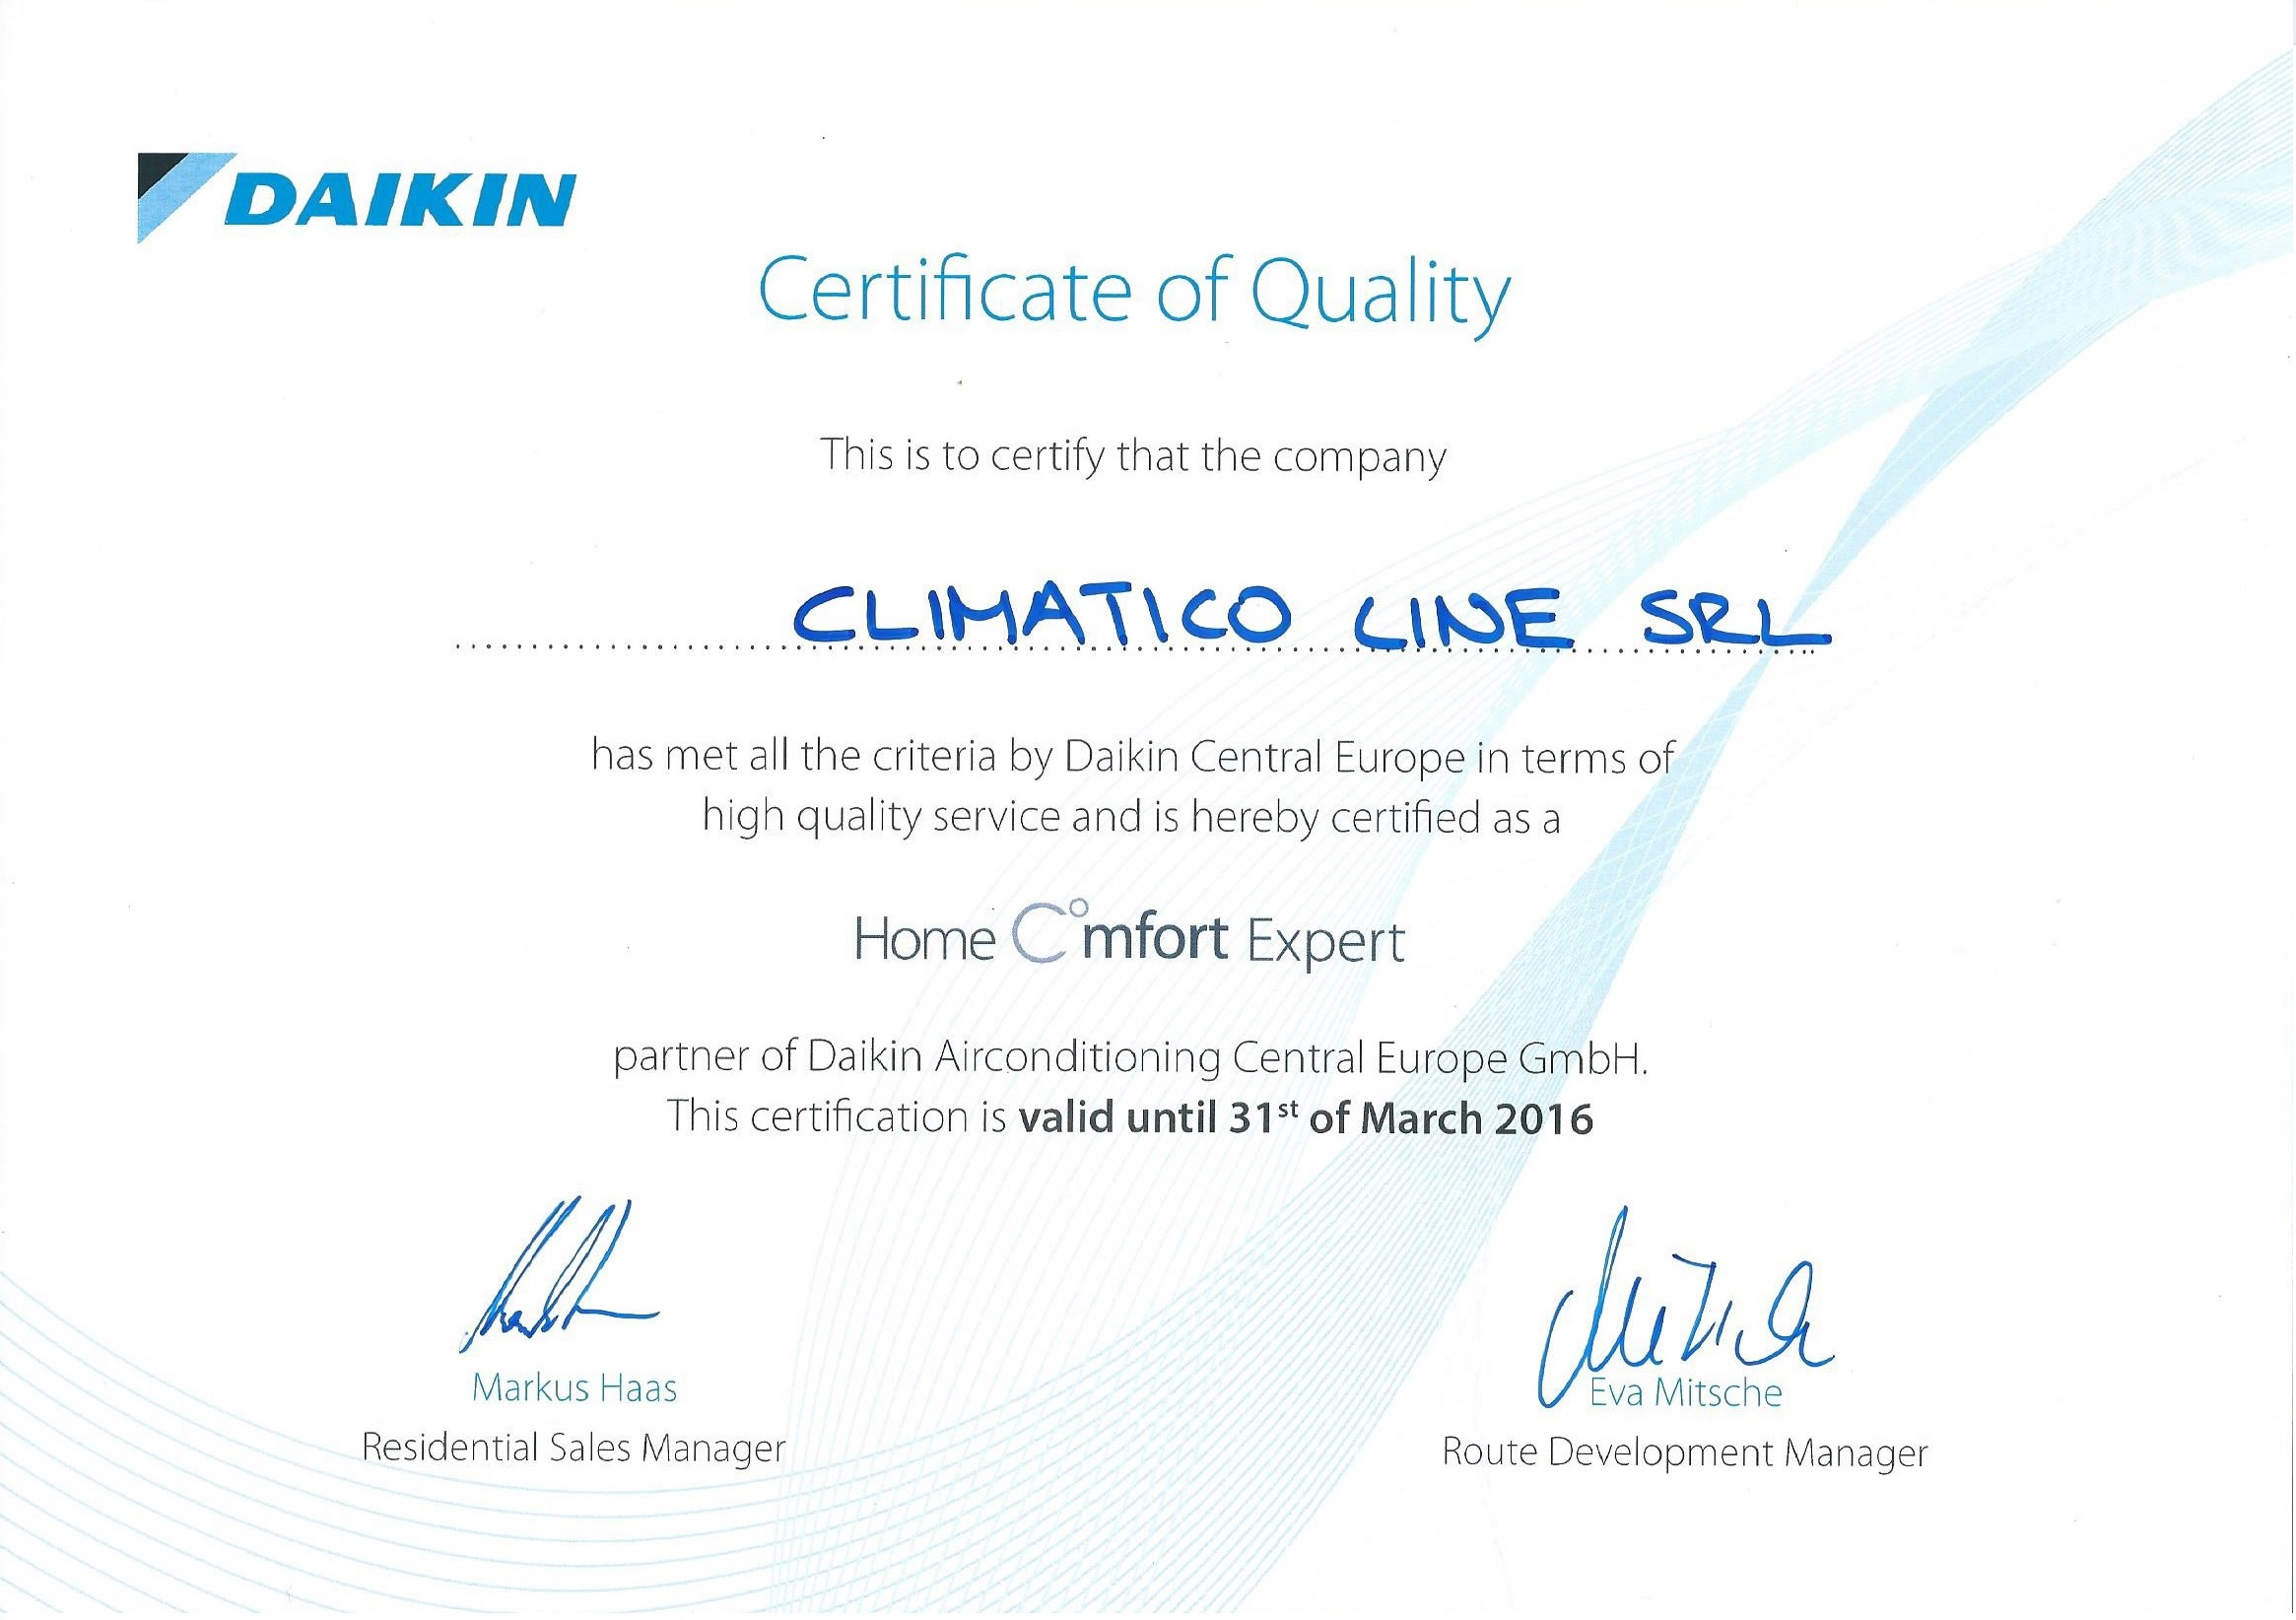 Climatico Daikin Home Comfort Expert